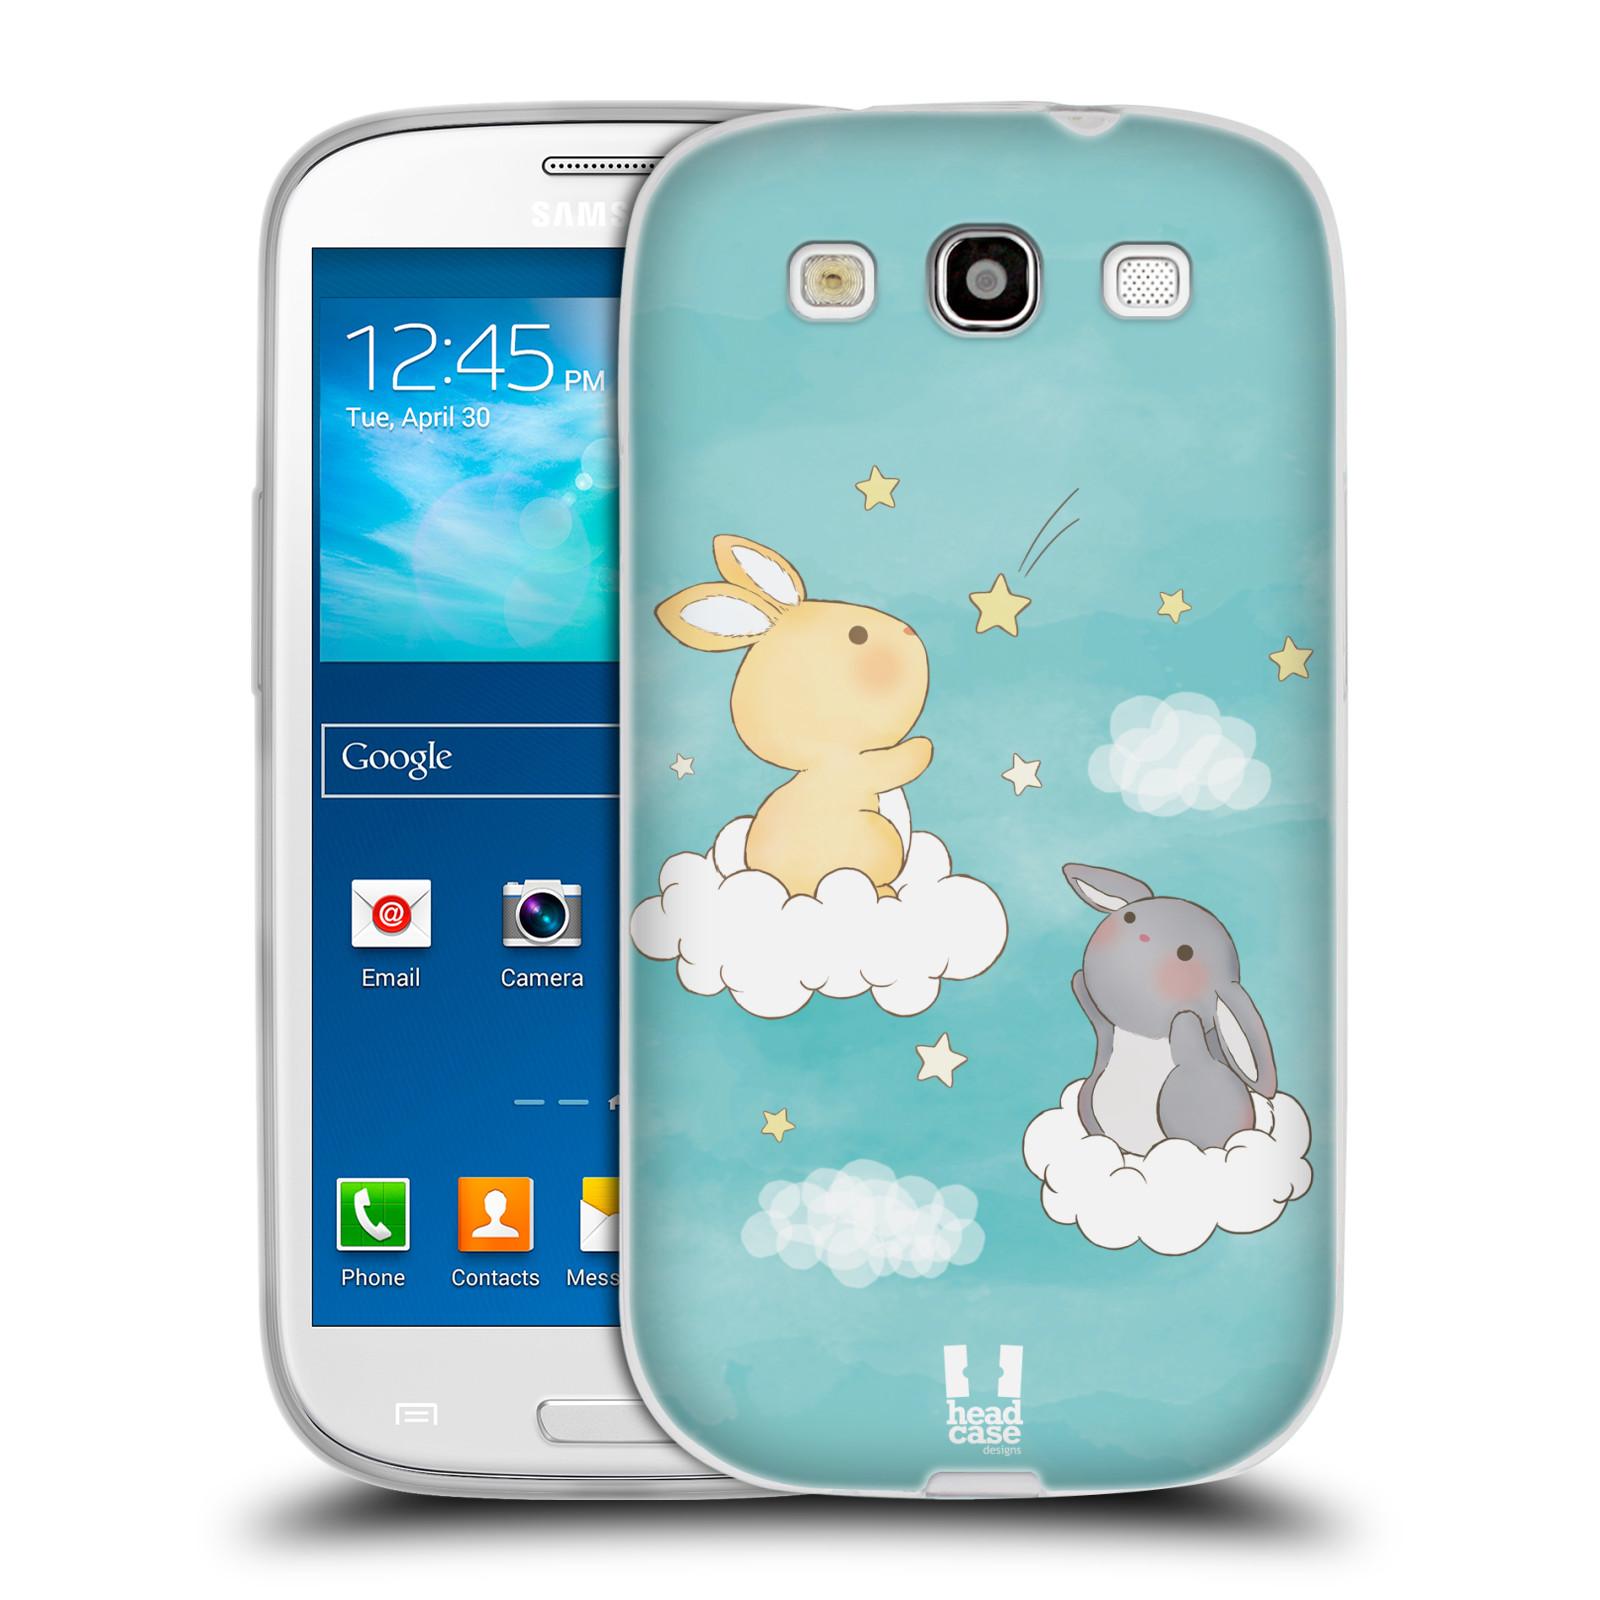 HEAD CASE silikonový obal na mobil Samsung Galaxy S3 i9300 vzor králíček a hvězdy modrá